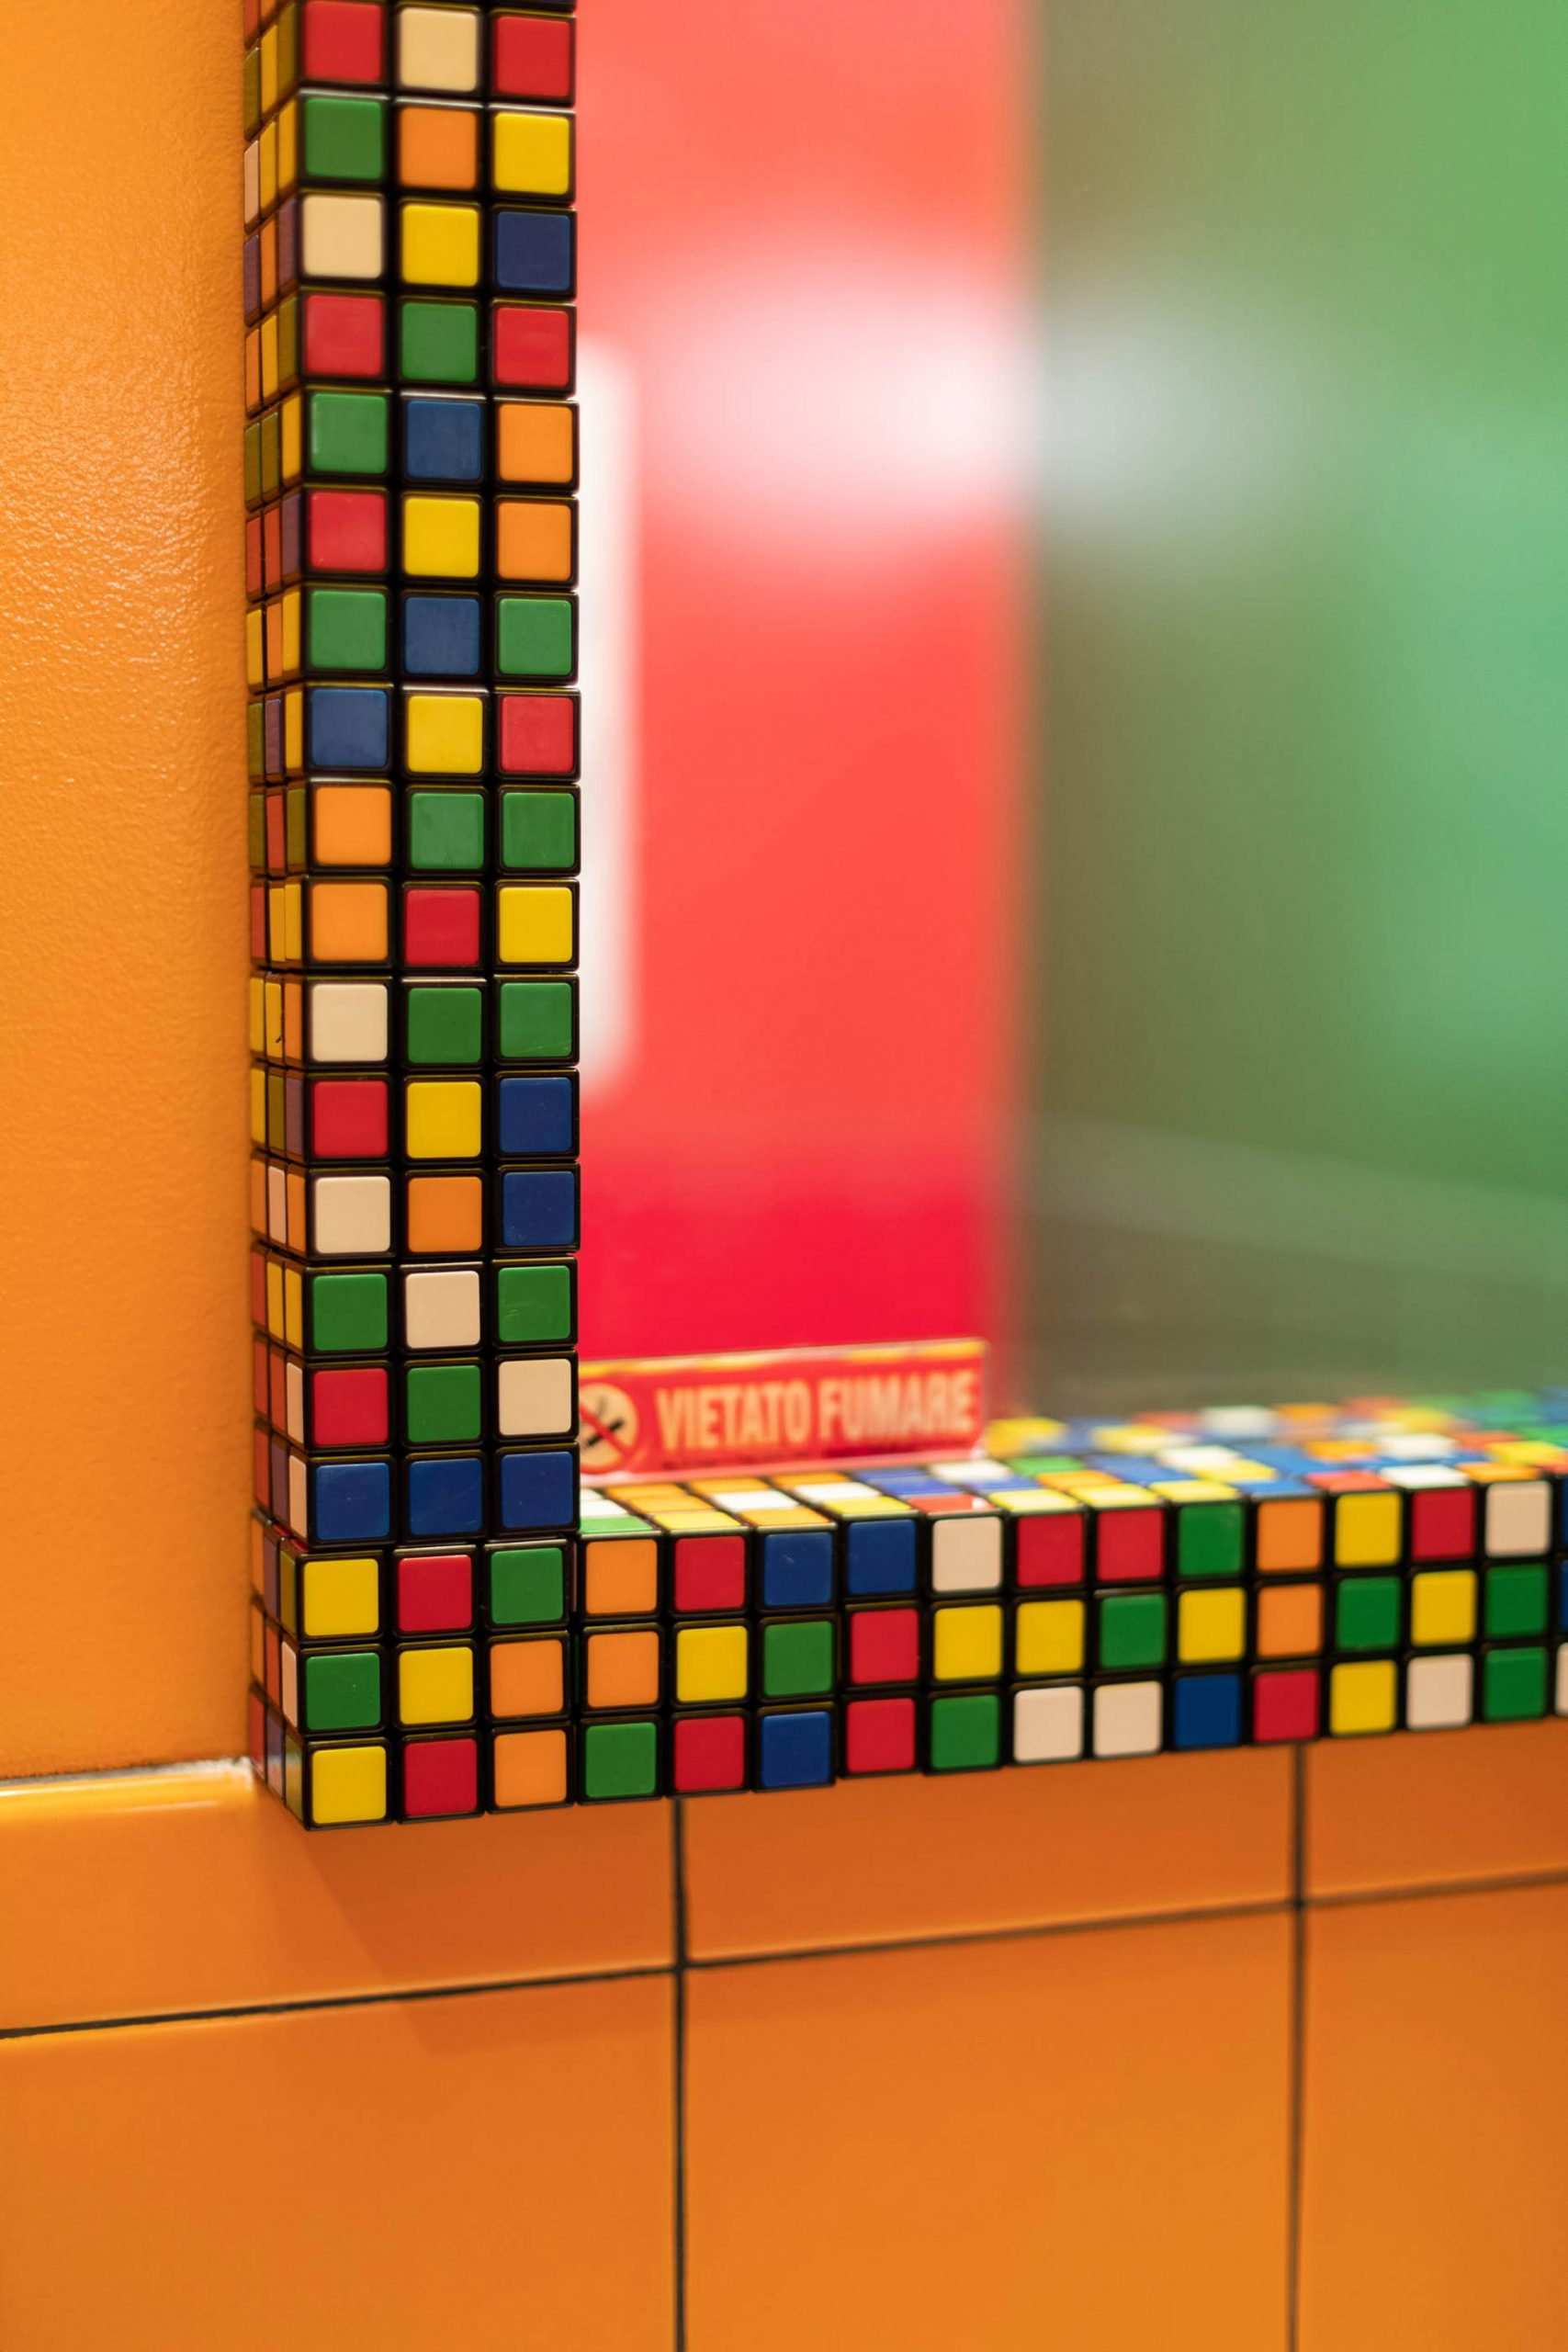 Rubik's Cube mirrors in the bathrooms of Caffettiera Caffé Bar